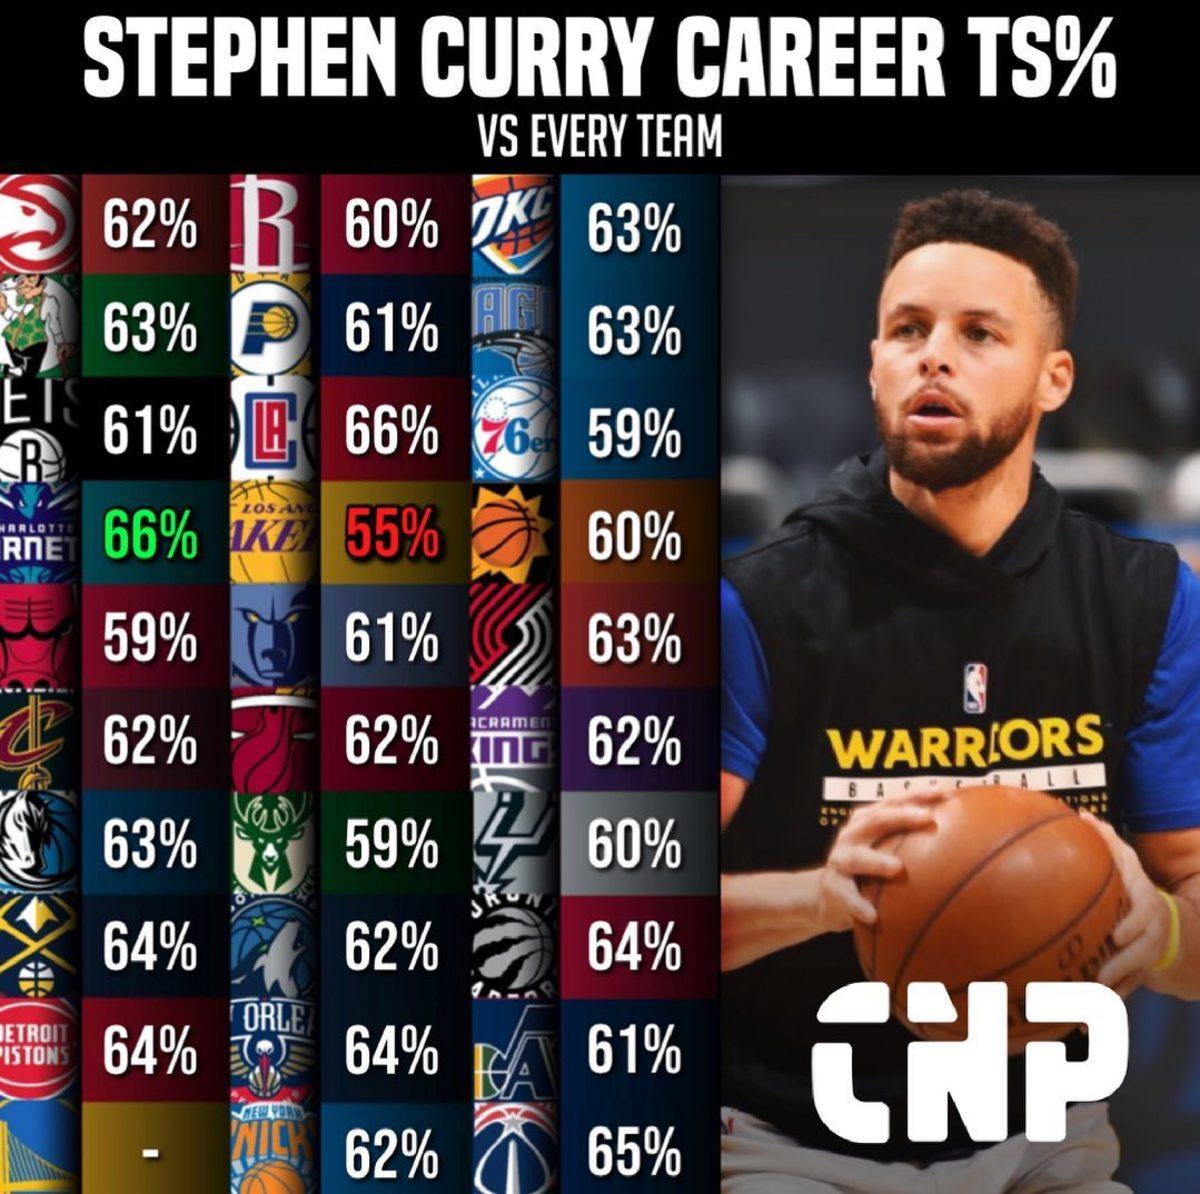 Stephen Curry Career TS%